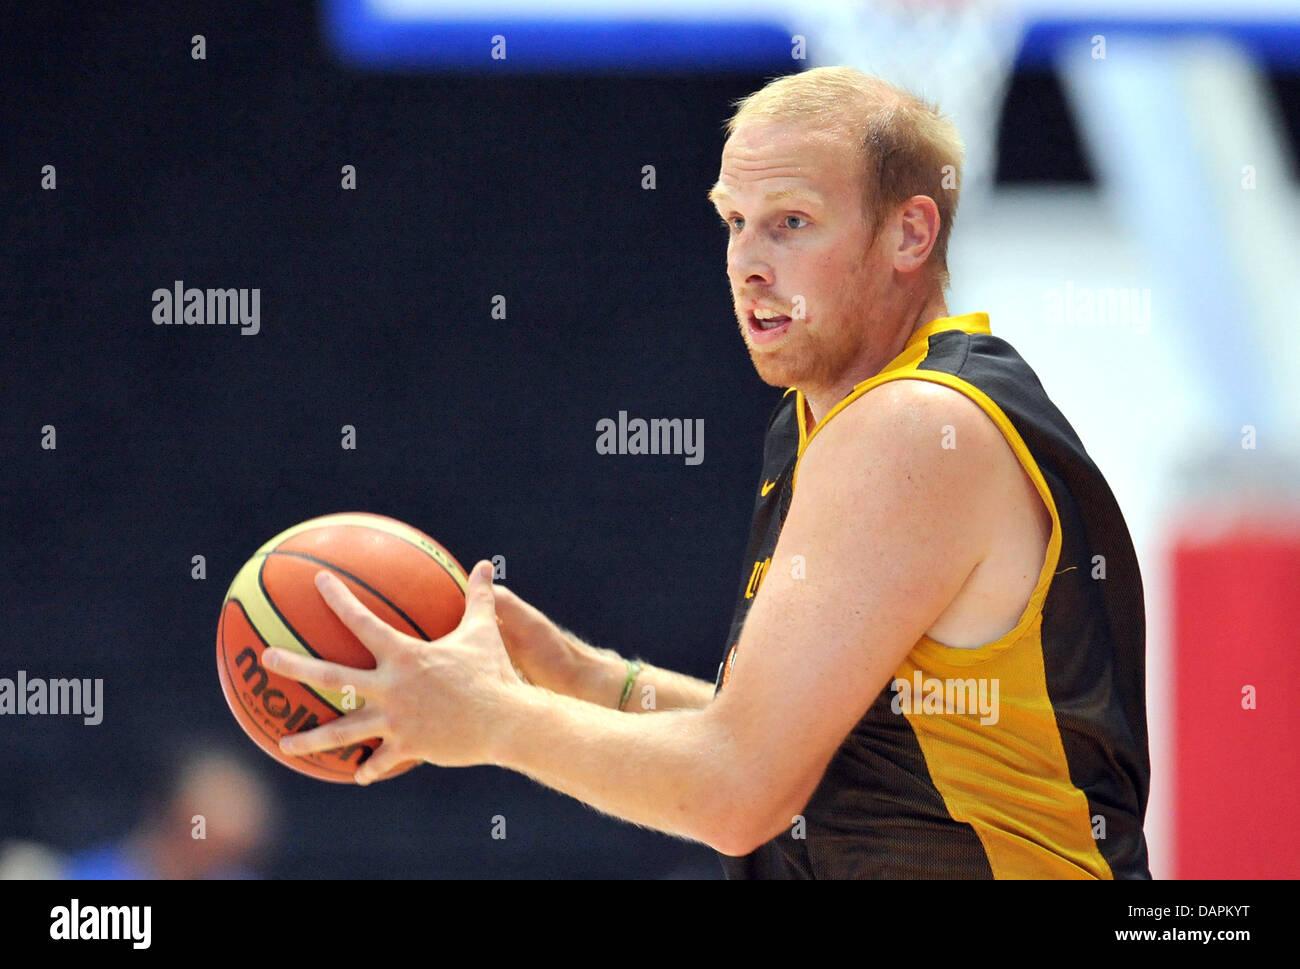 German basketball player Chris Kaman Hamann plays the ball during